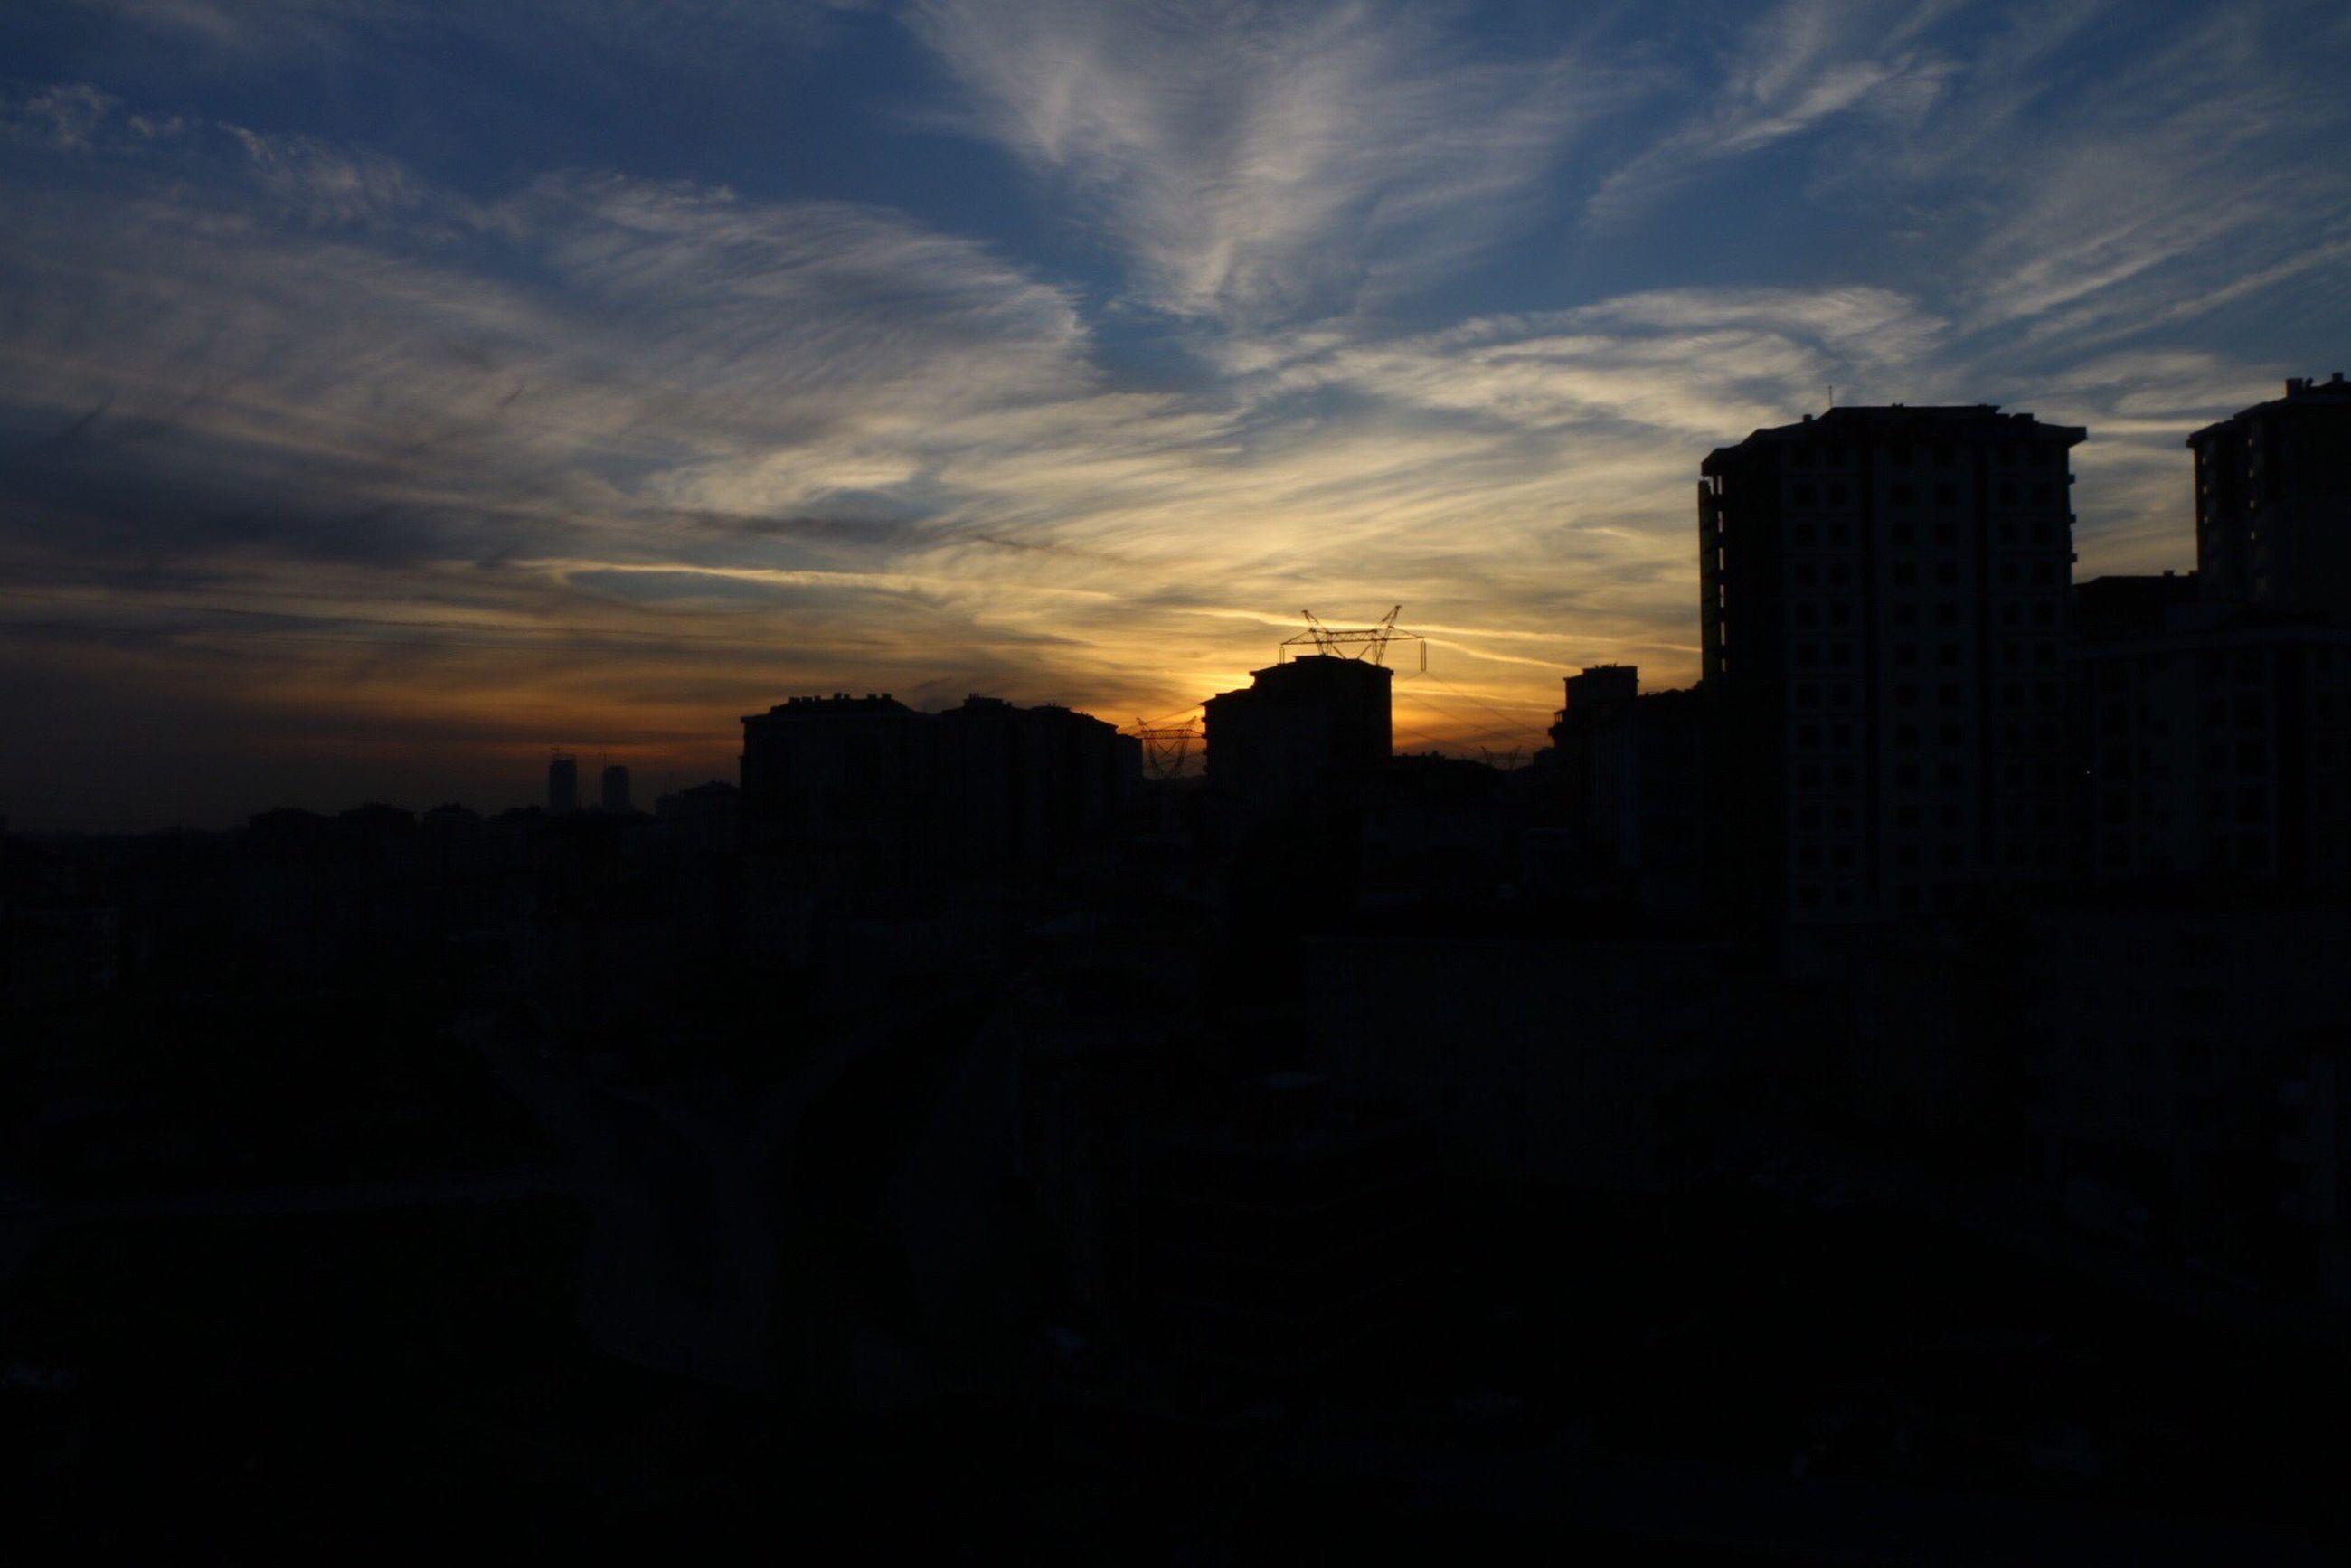 sunset, silhouette, building exterior, architecture, built structure, sky, cloud - sky, city, dark, cloud, dusk, residential structure, orange color, residential building, scenics, outline, cityscape, building, beauty in nature, house